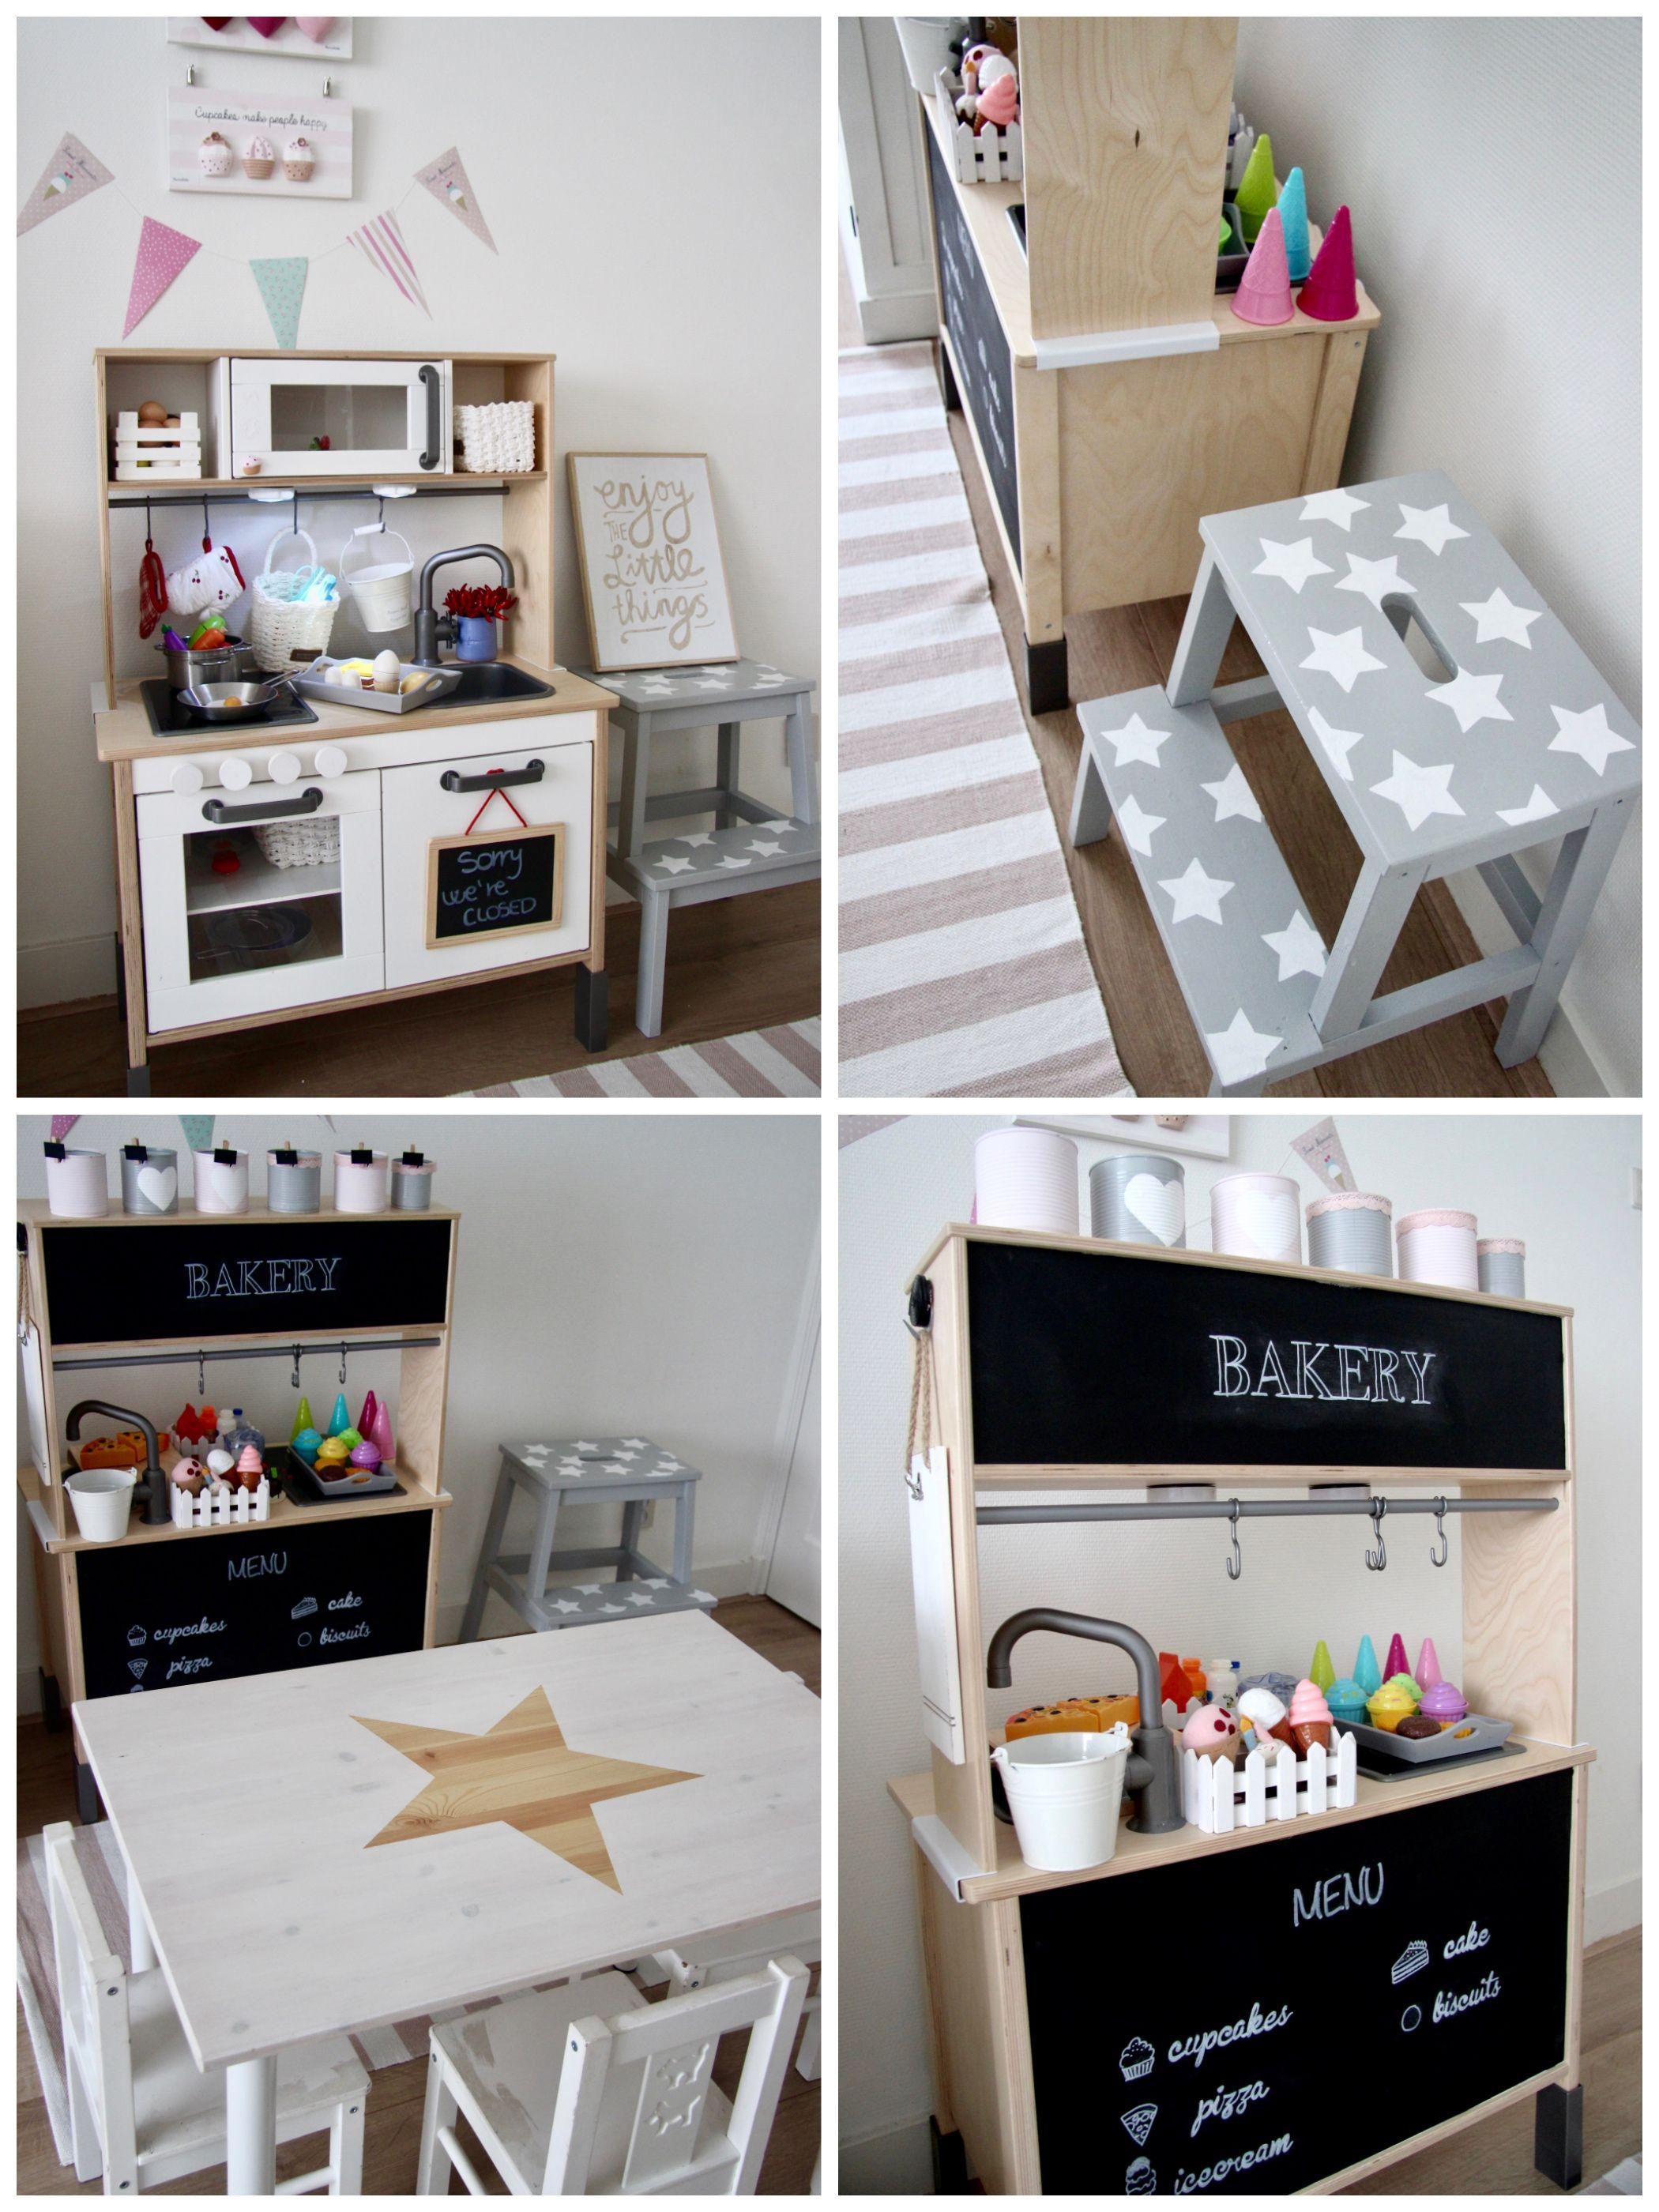 Ikea kitchen makeover...by Biancolatte decor